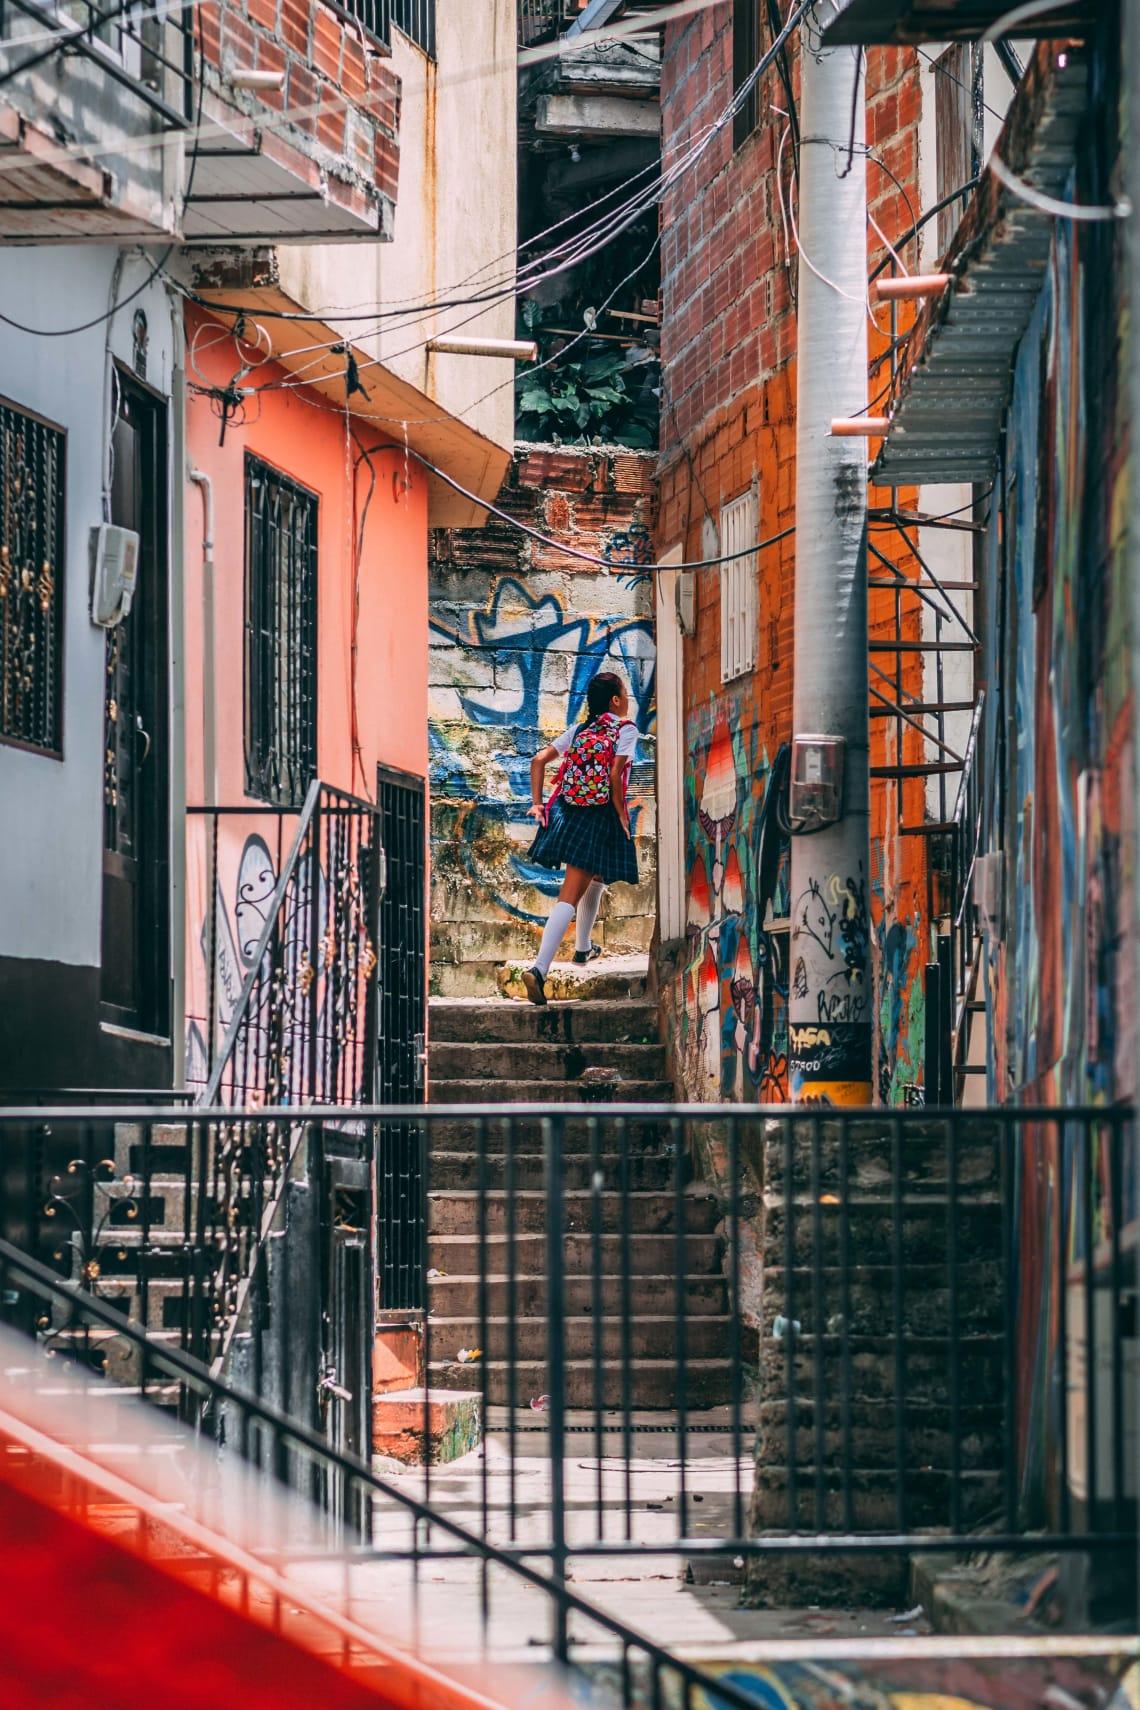 Colorful alleys, Medellin, Colombia